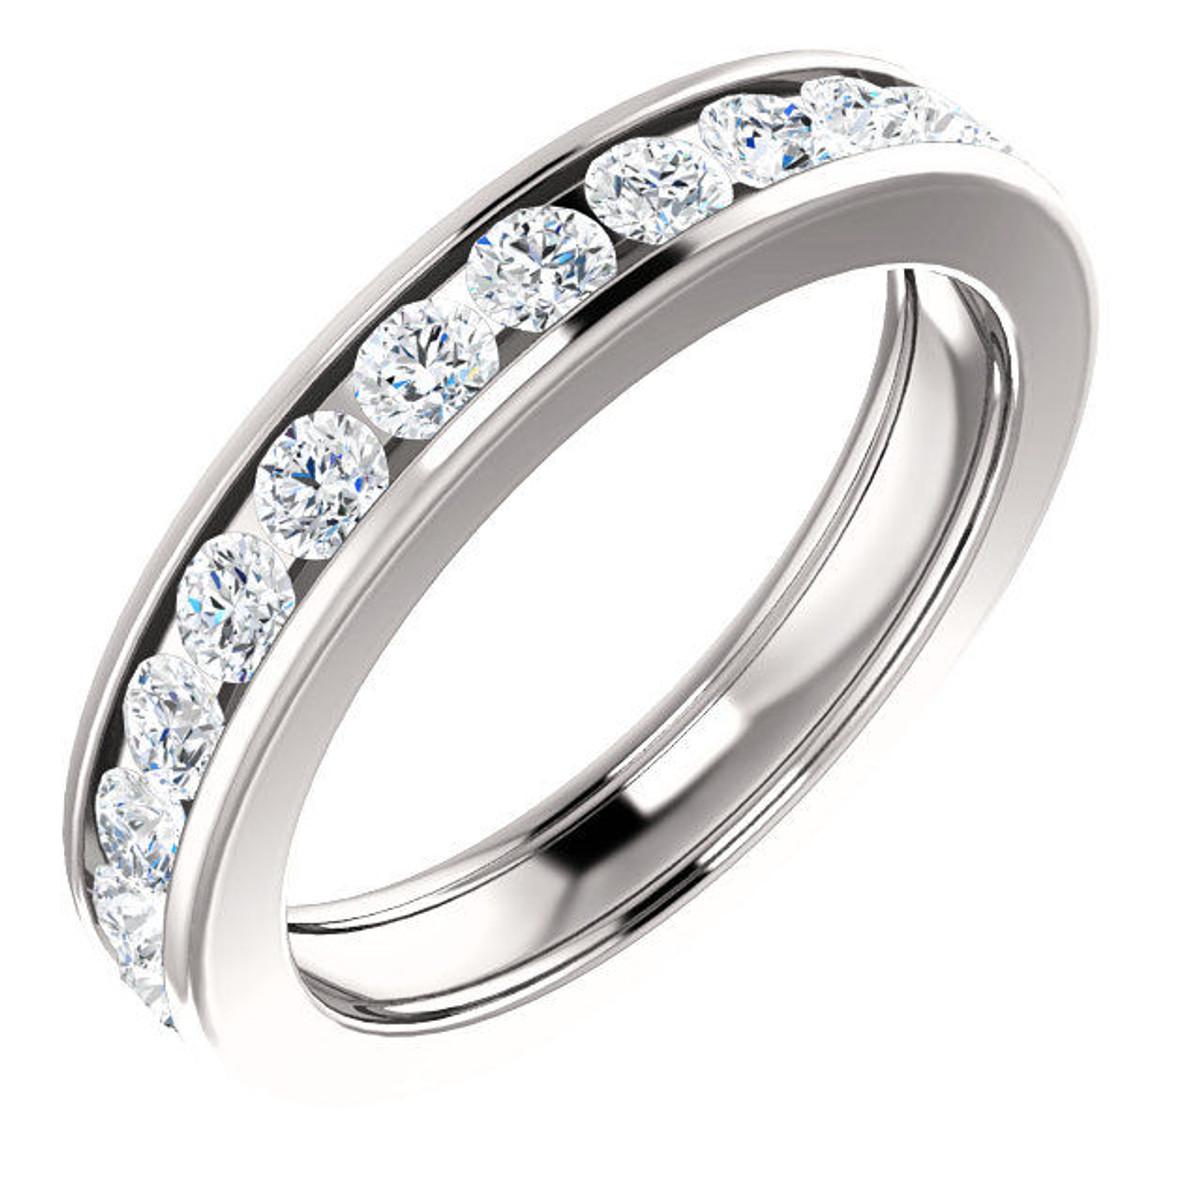 Platinum 1.5 CT TW Channel Set Diamond Eternity Ring